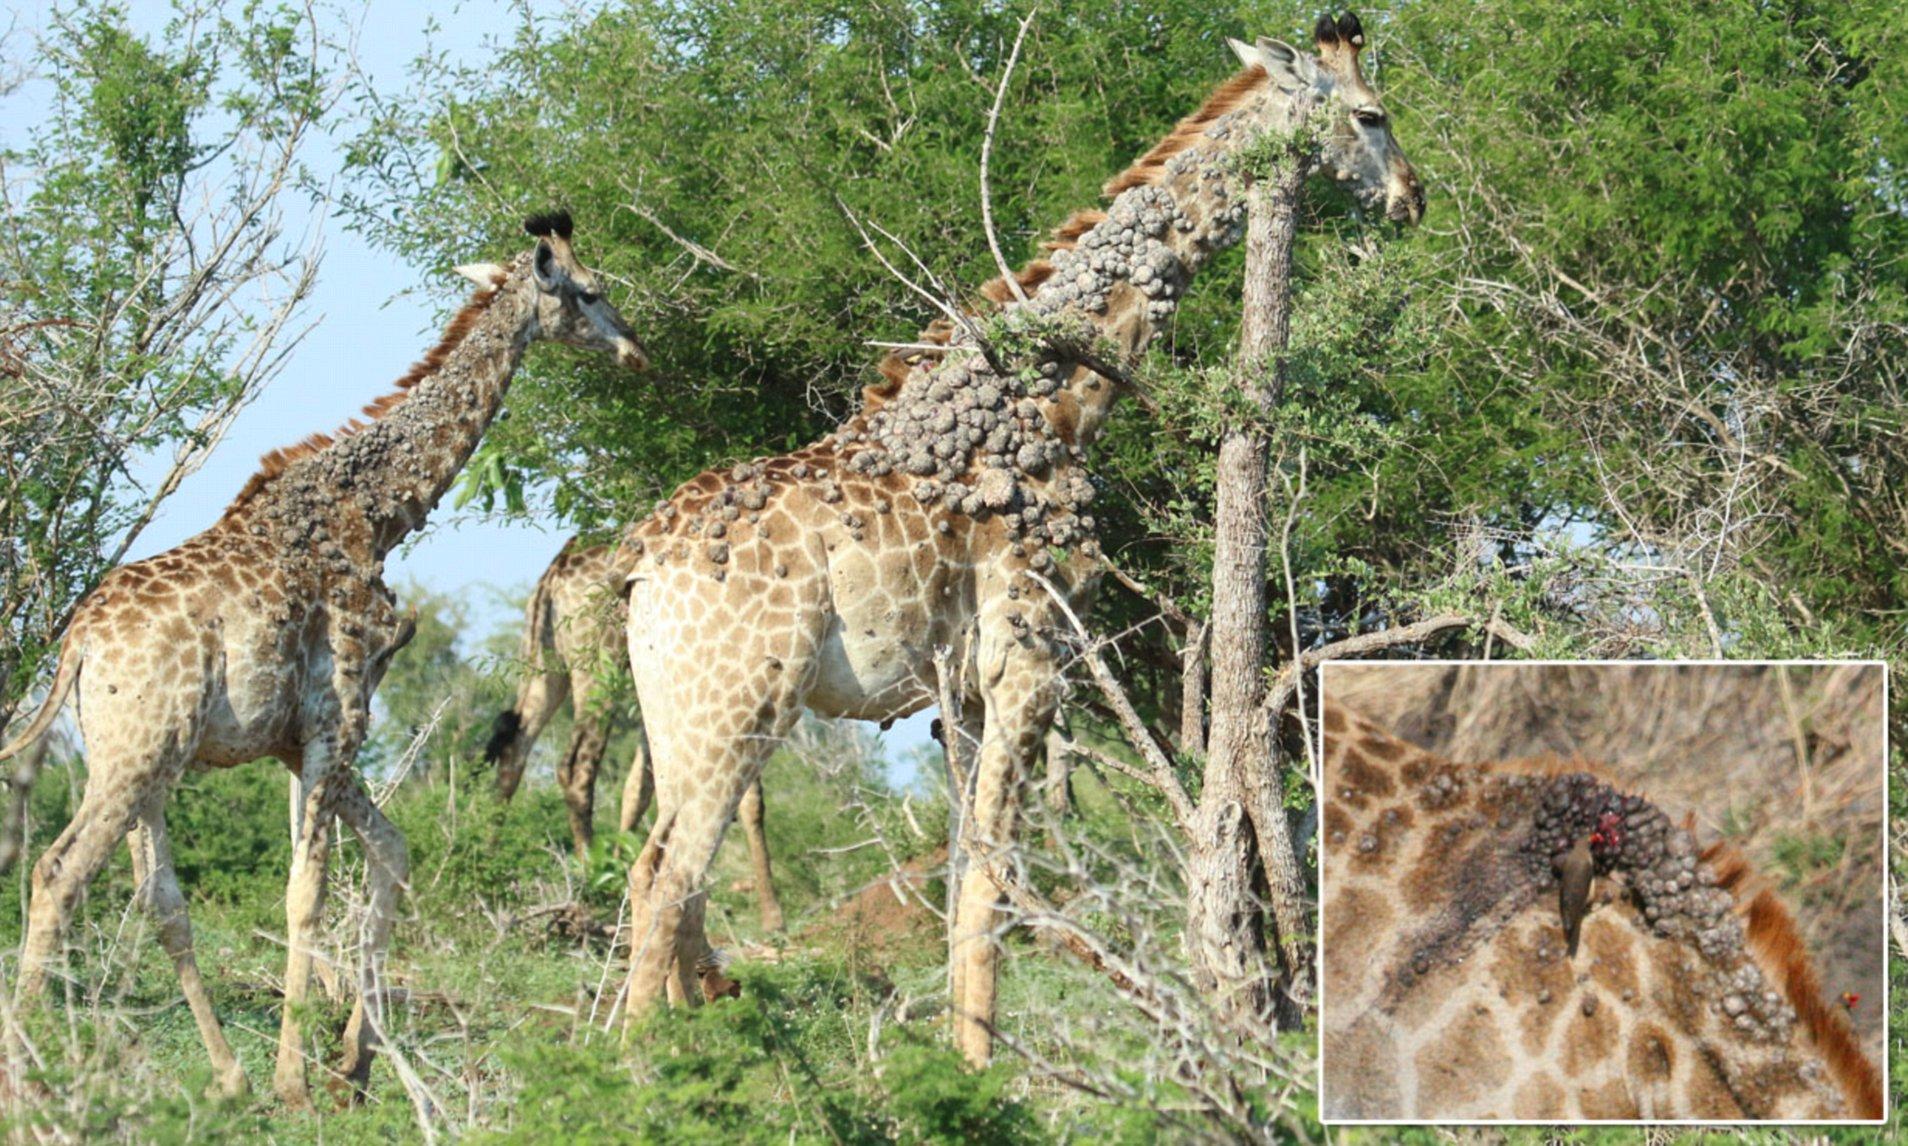 papillomavirus giraffe helminth immunomodulation in autoimmune disease